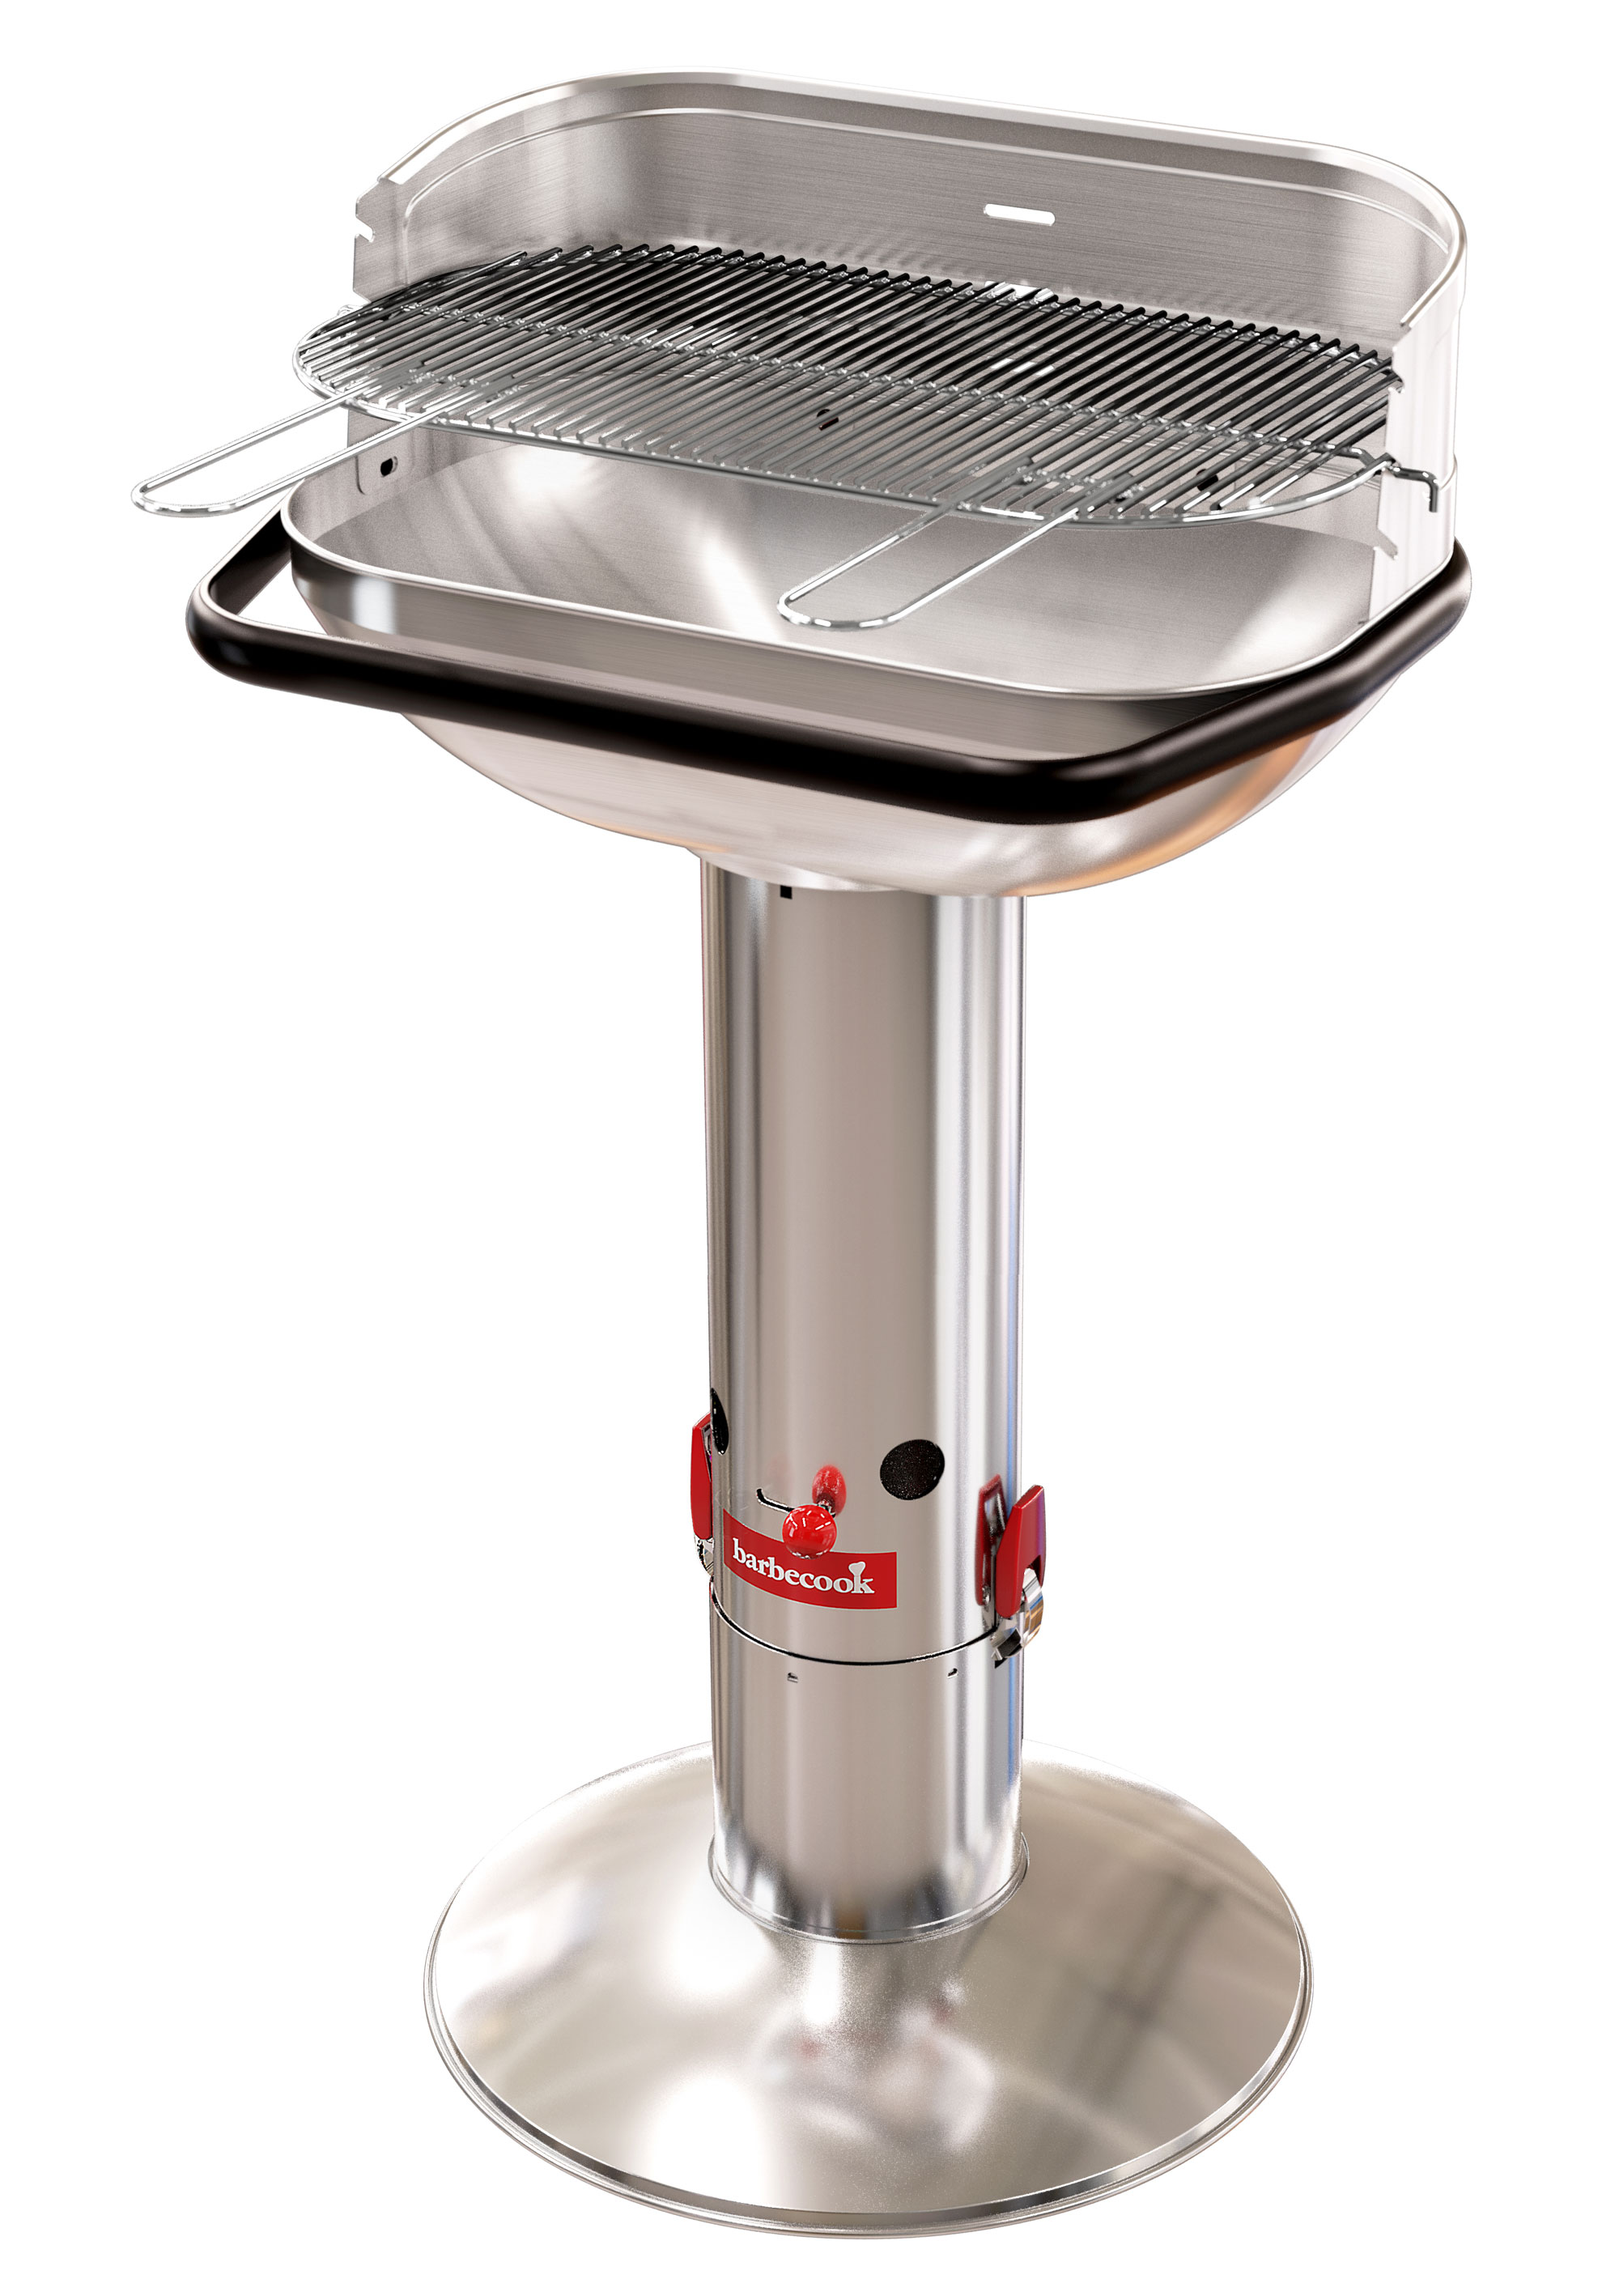 Säulengrill / Holzkohlegrill barbecook Loewy 55 SST Grillfl. 56x43cm Bild 1